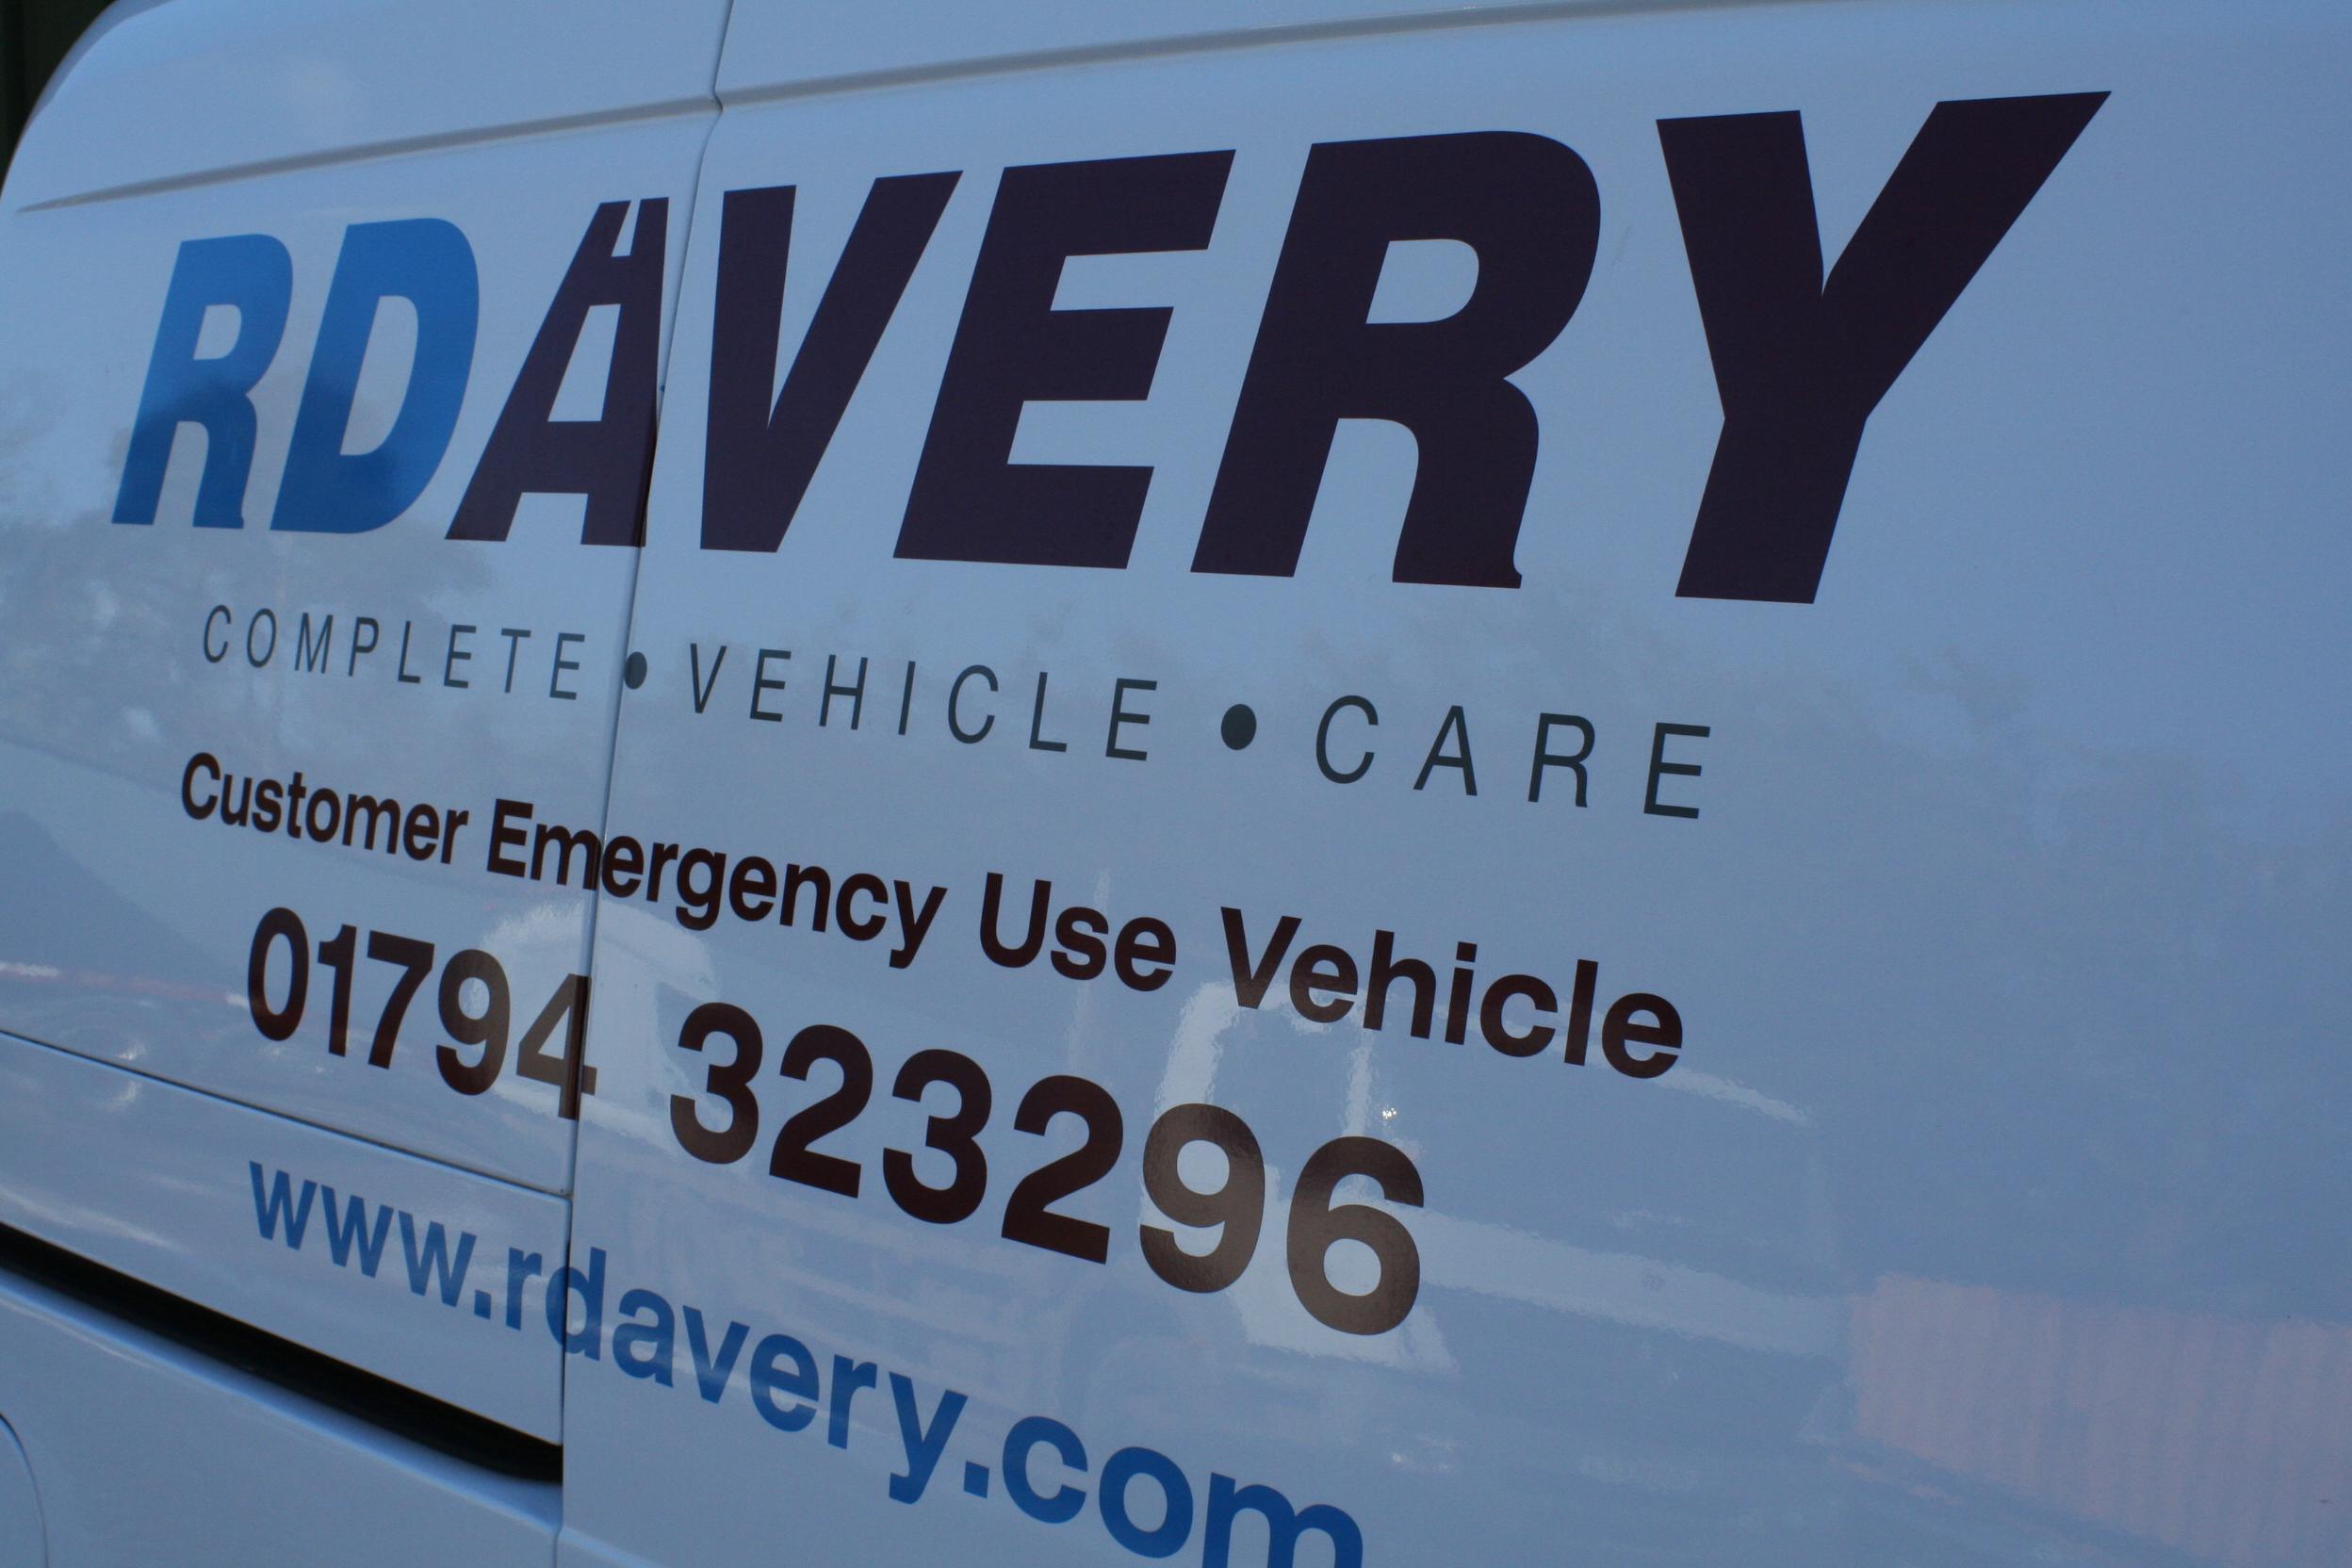 Customer-Emergency-Use-Vehicle.JPG